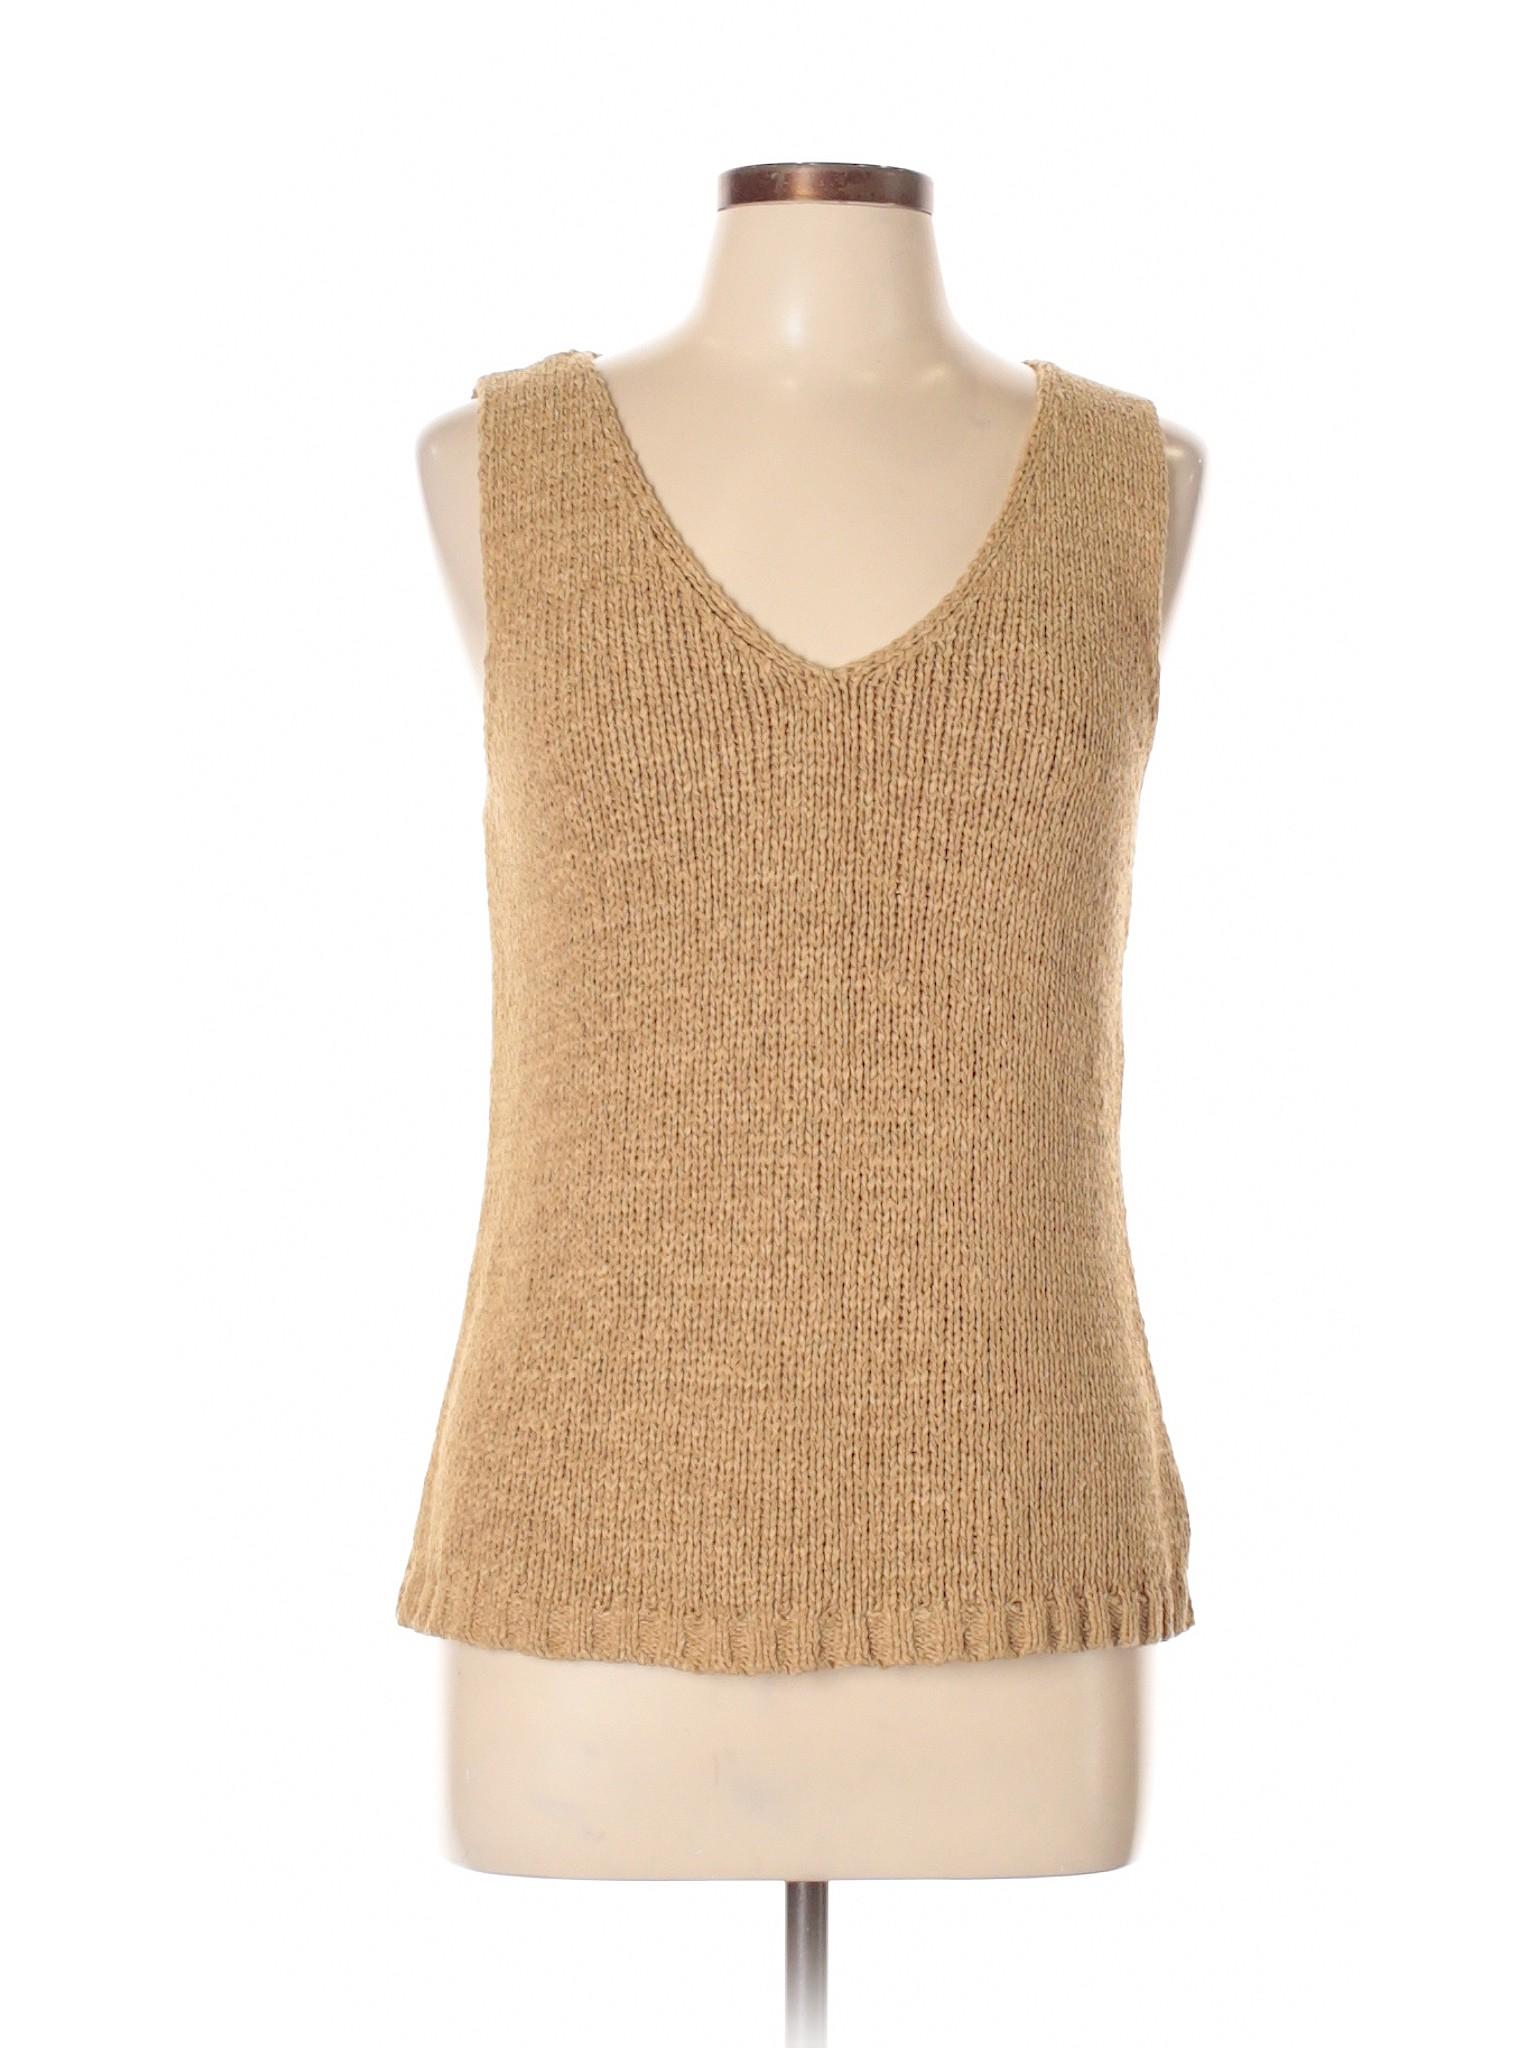 Sweater New Pullover York Jones Boutique qInw451vR